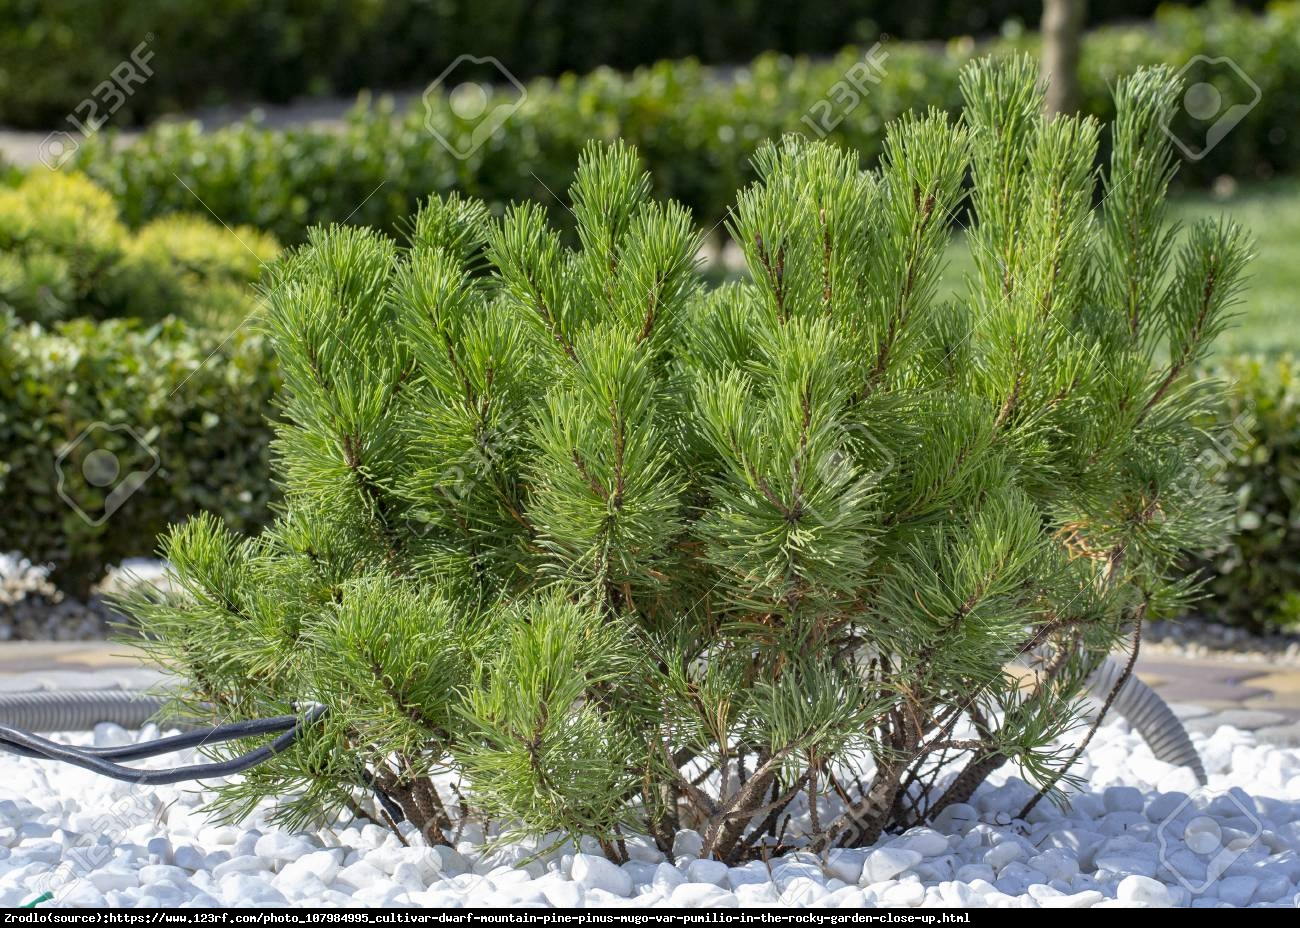 Kosodrzewina - Sosna górska - Pinus mugo var pumilio